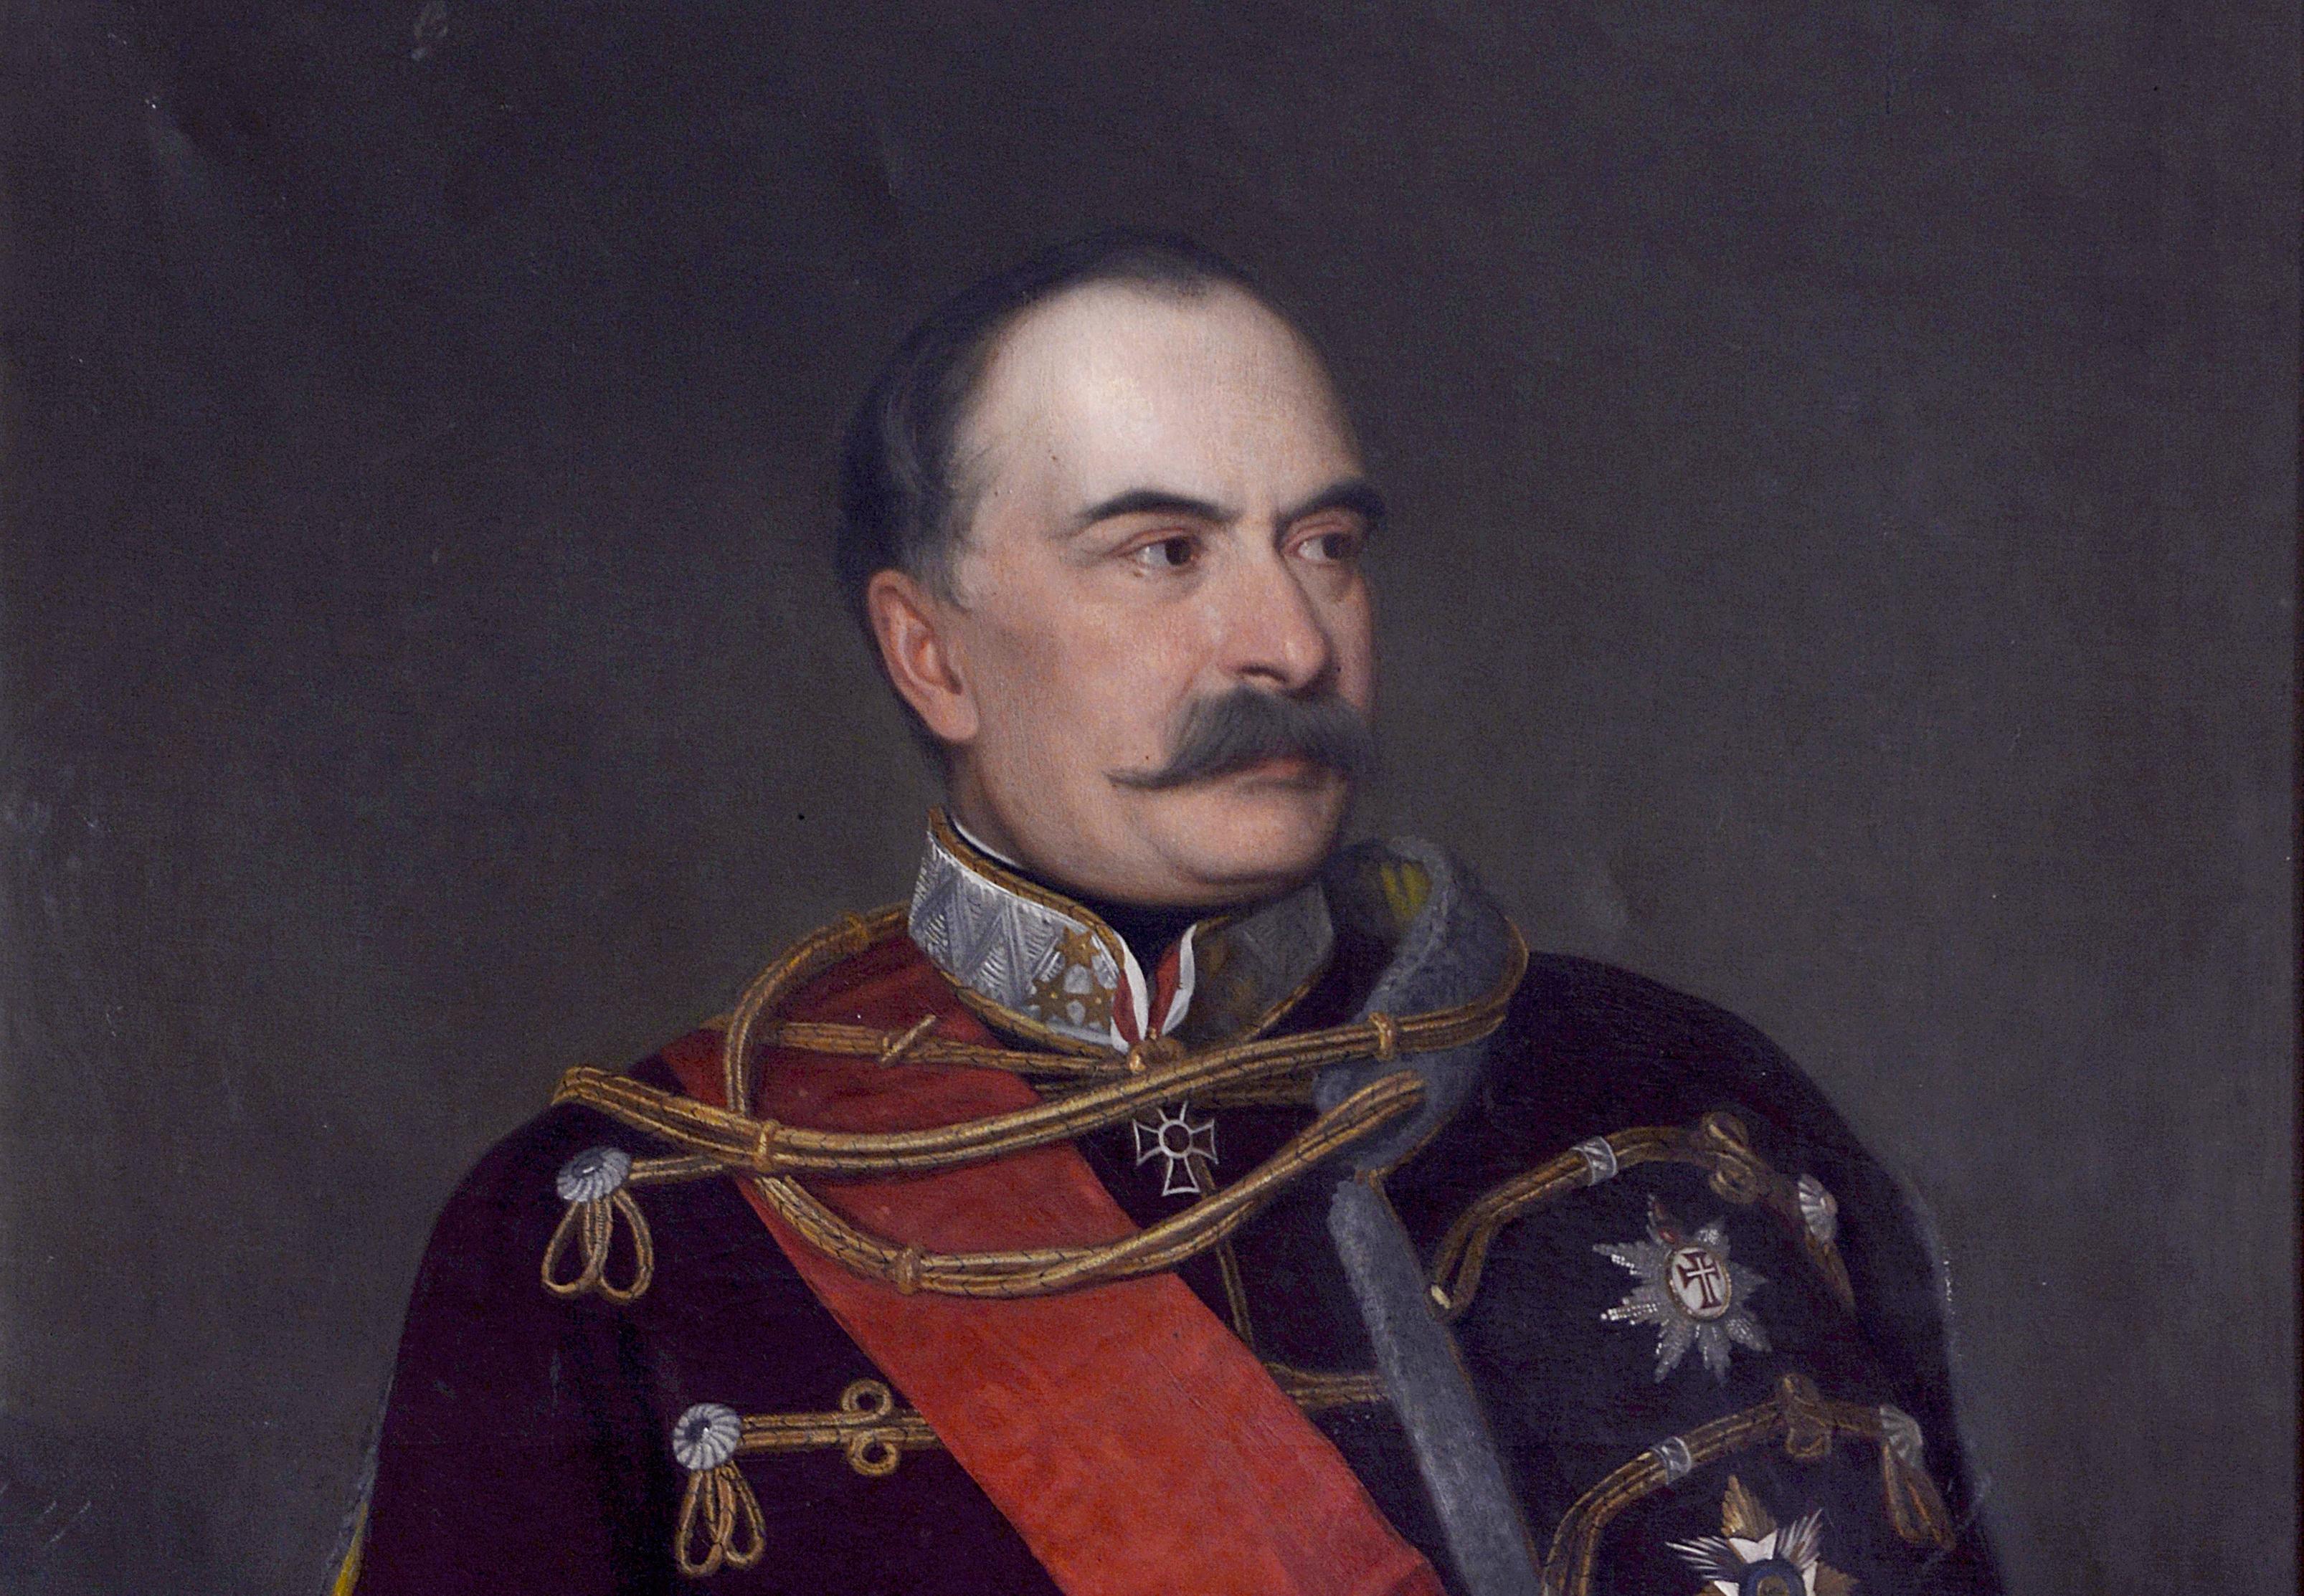 Alfons Friedrich Mensdorff-Pouilly